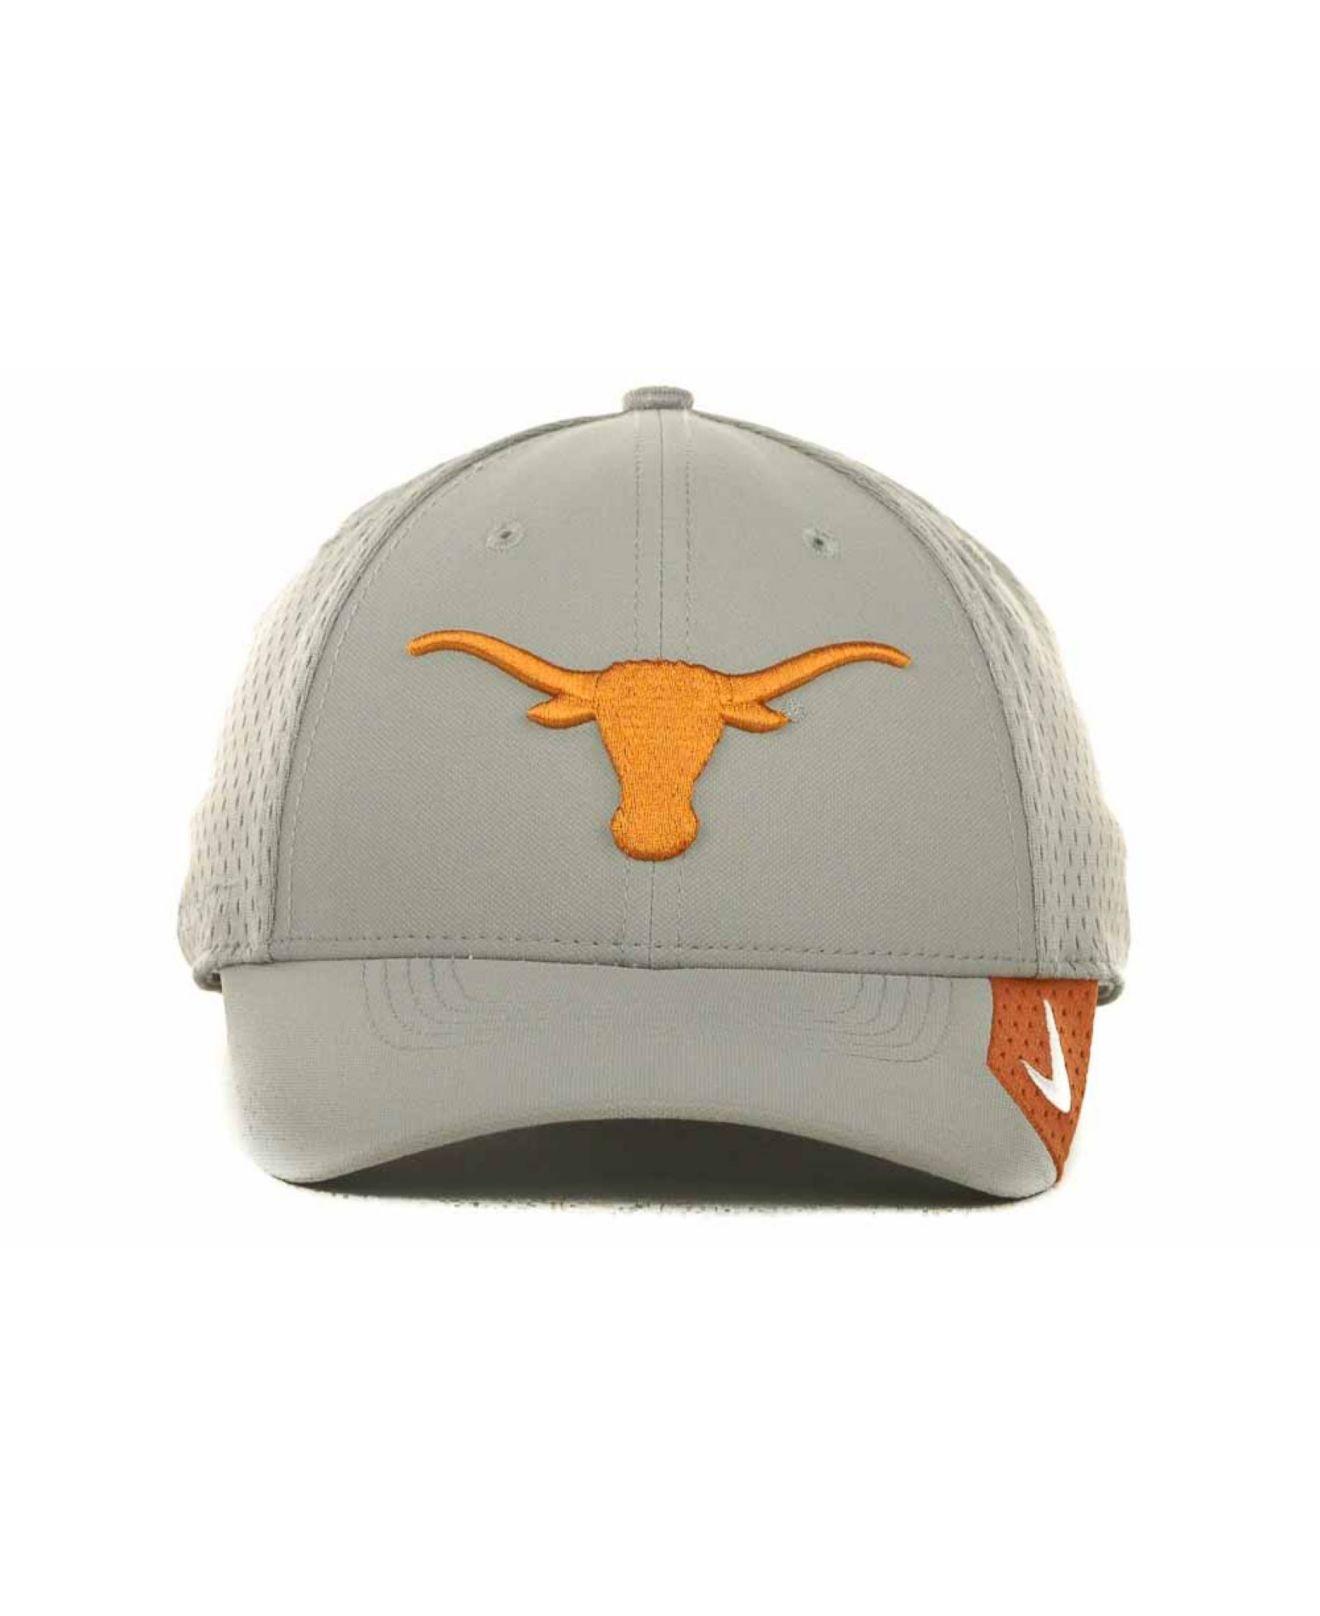 best service 35baa 7f636 ... discount lyst nike texas longhorns mesh swooshflex cap in gray for men  b77ac 08c32